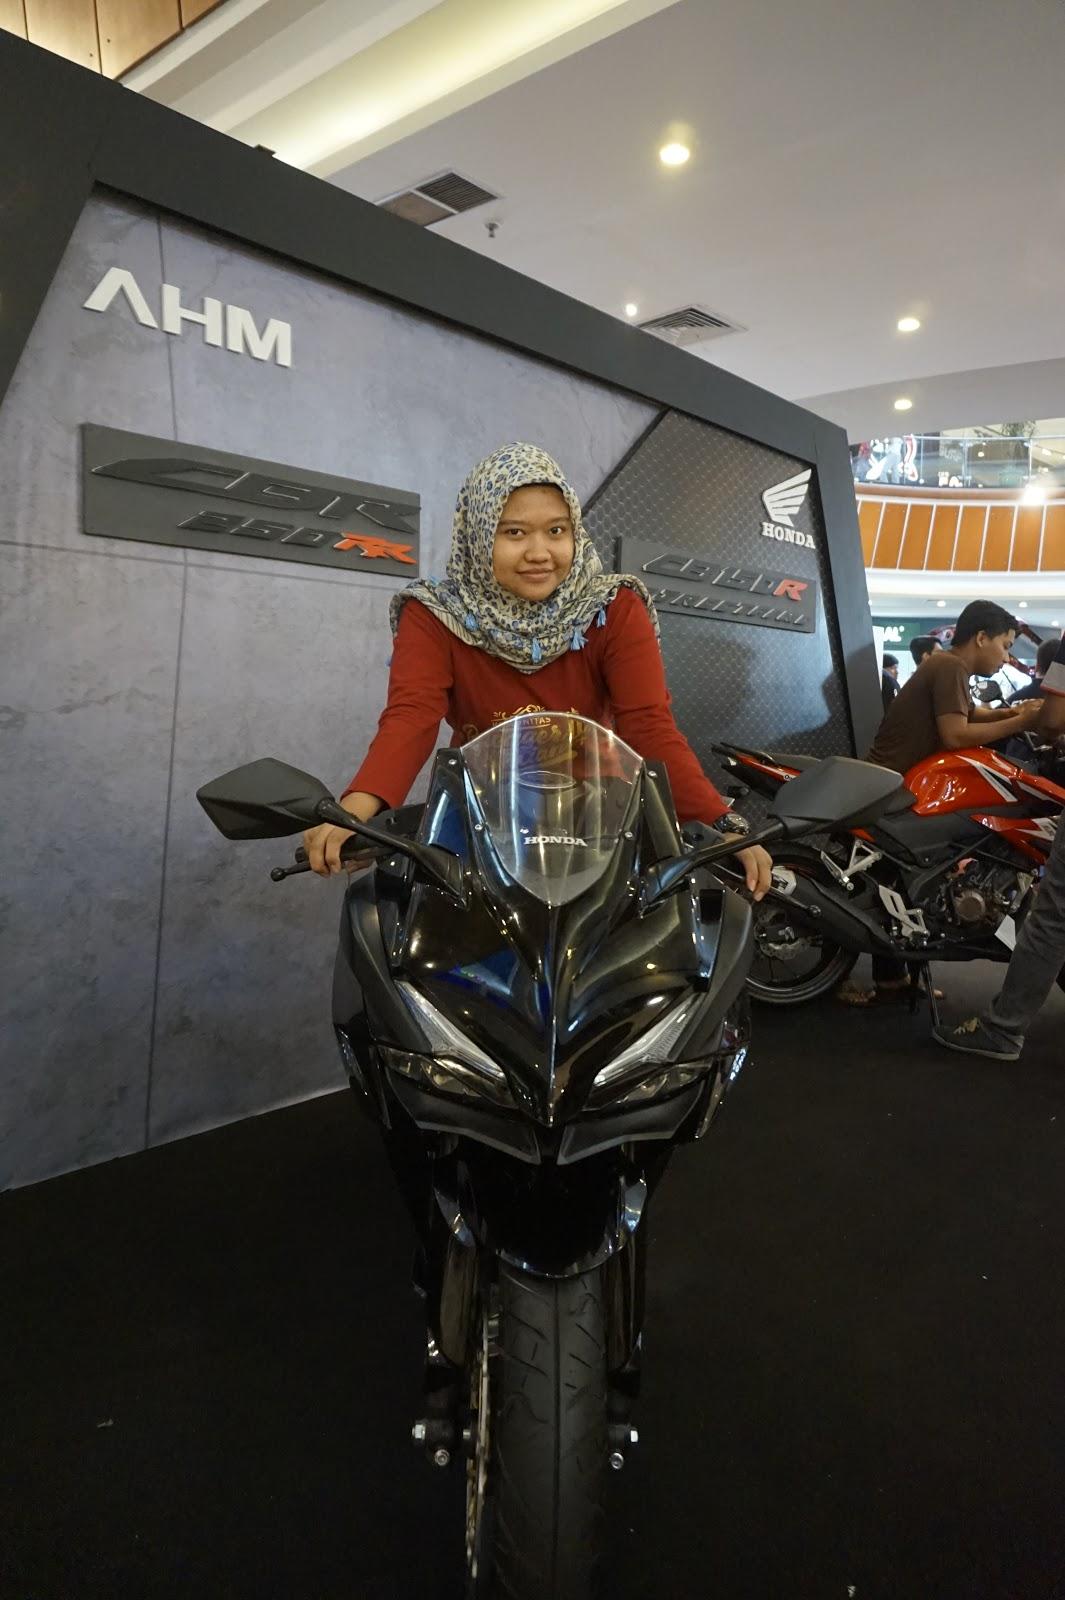 Dare Pontianak All New Cb 150r Streetfire Honda Racing Red Kab Semarang Semakin Keren Dengan Cb150r Street Fire